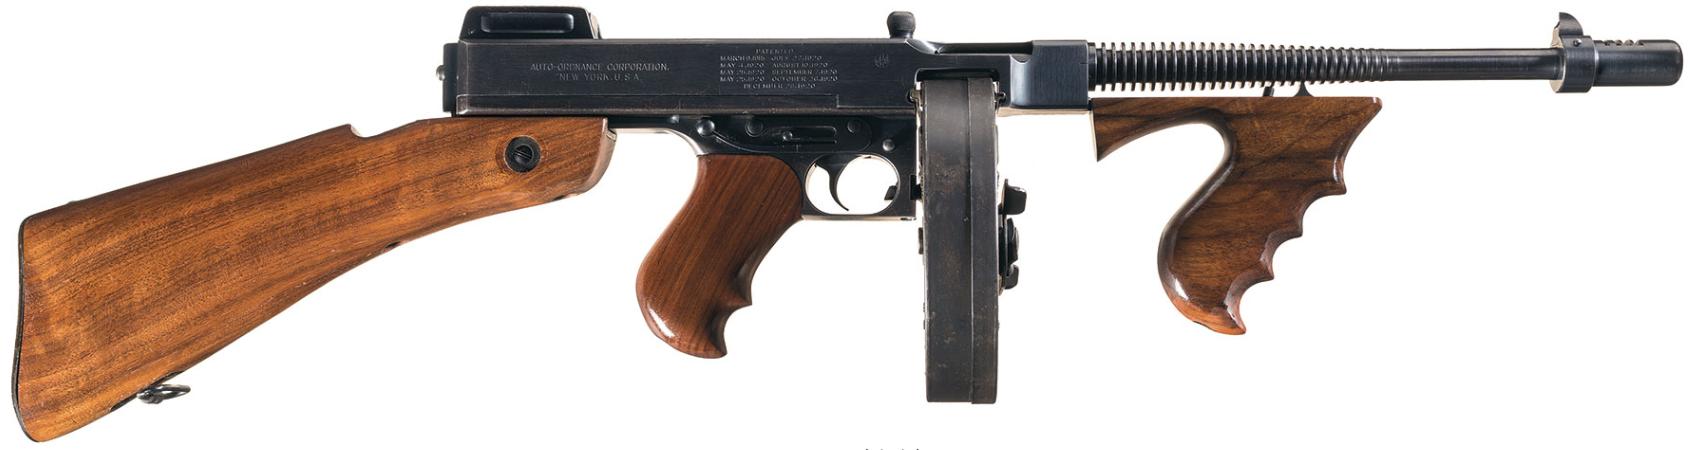 Thompson submachine gun | Gun Wiki | FANDOM powered by Wikia